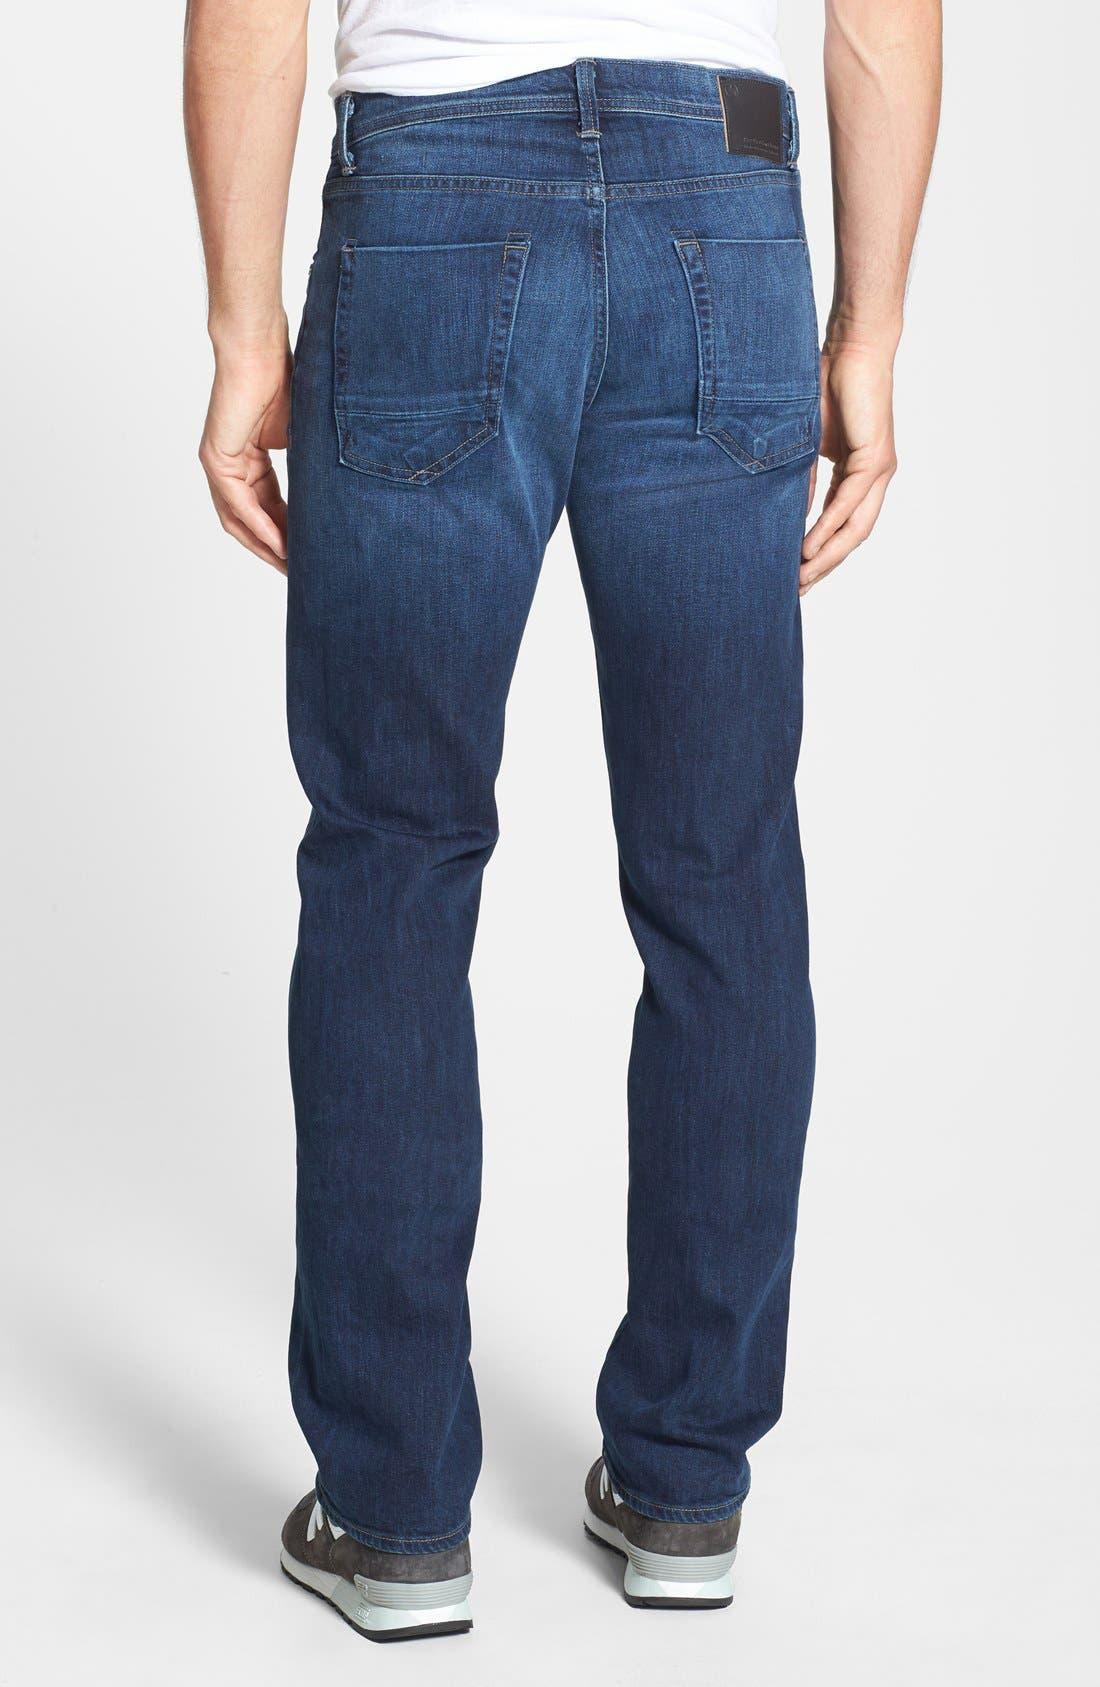 'Pragmatist Big Drake 4 Year Flex' Straight Leg Italian Stretch Denim Jeans,                             Alternate thumbnail 3, color,                             421